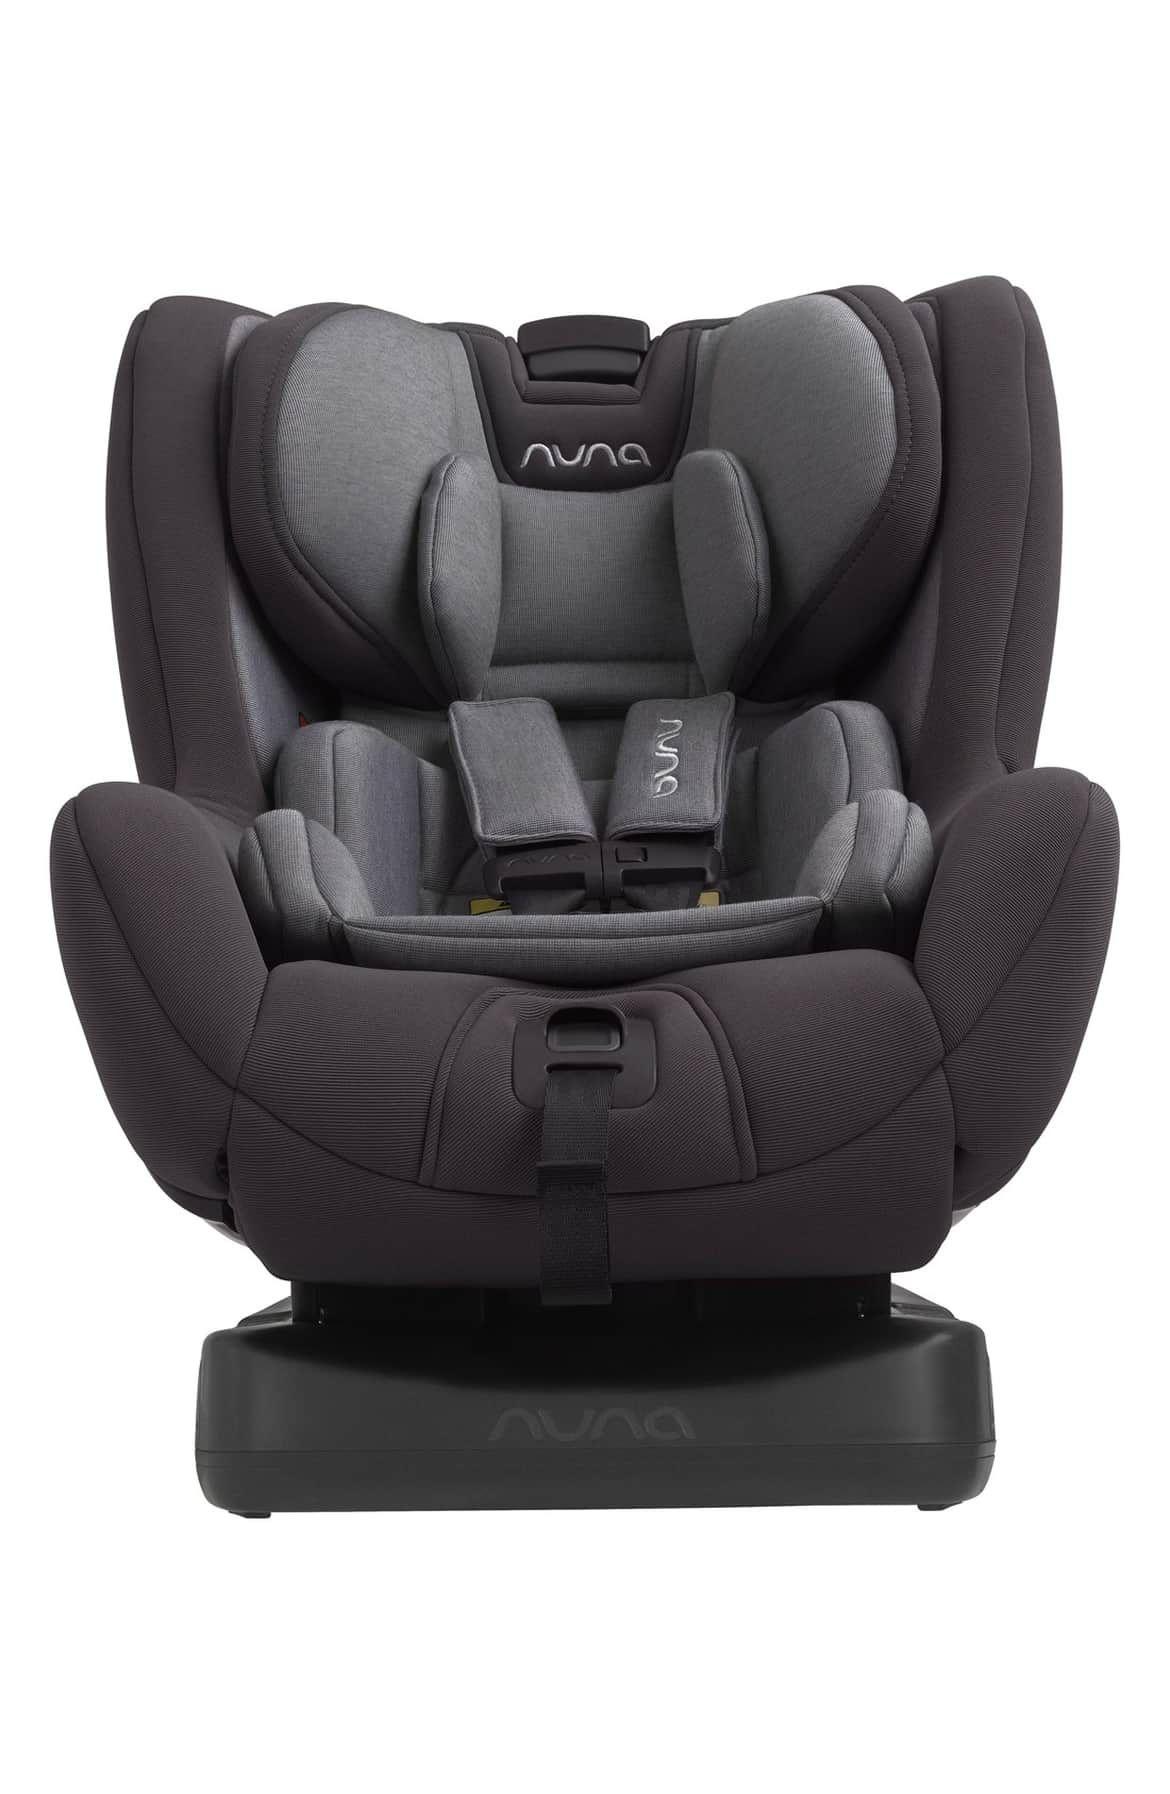 nuna RAVA™ Convertible Car Seat Best convertible car